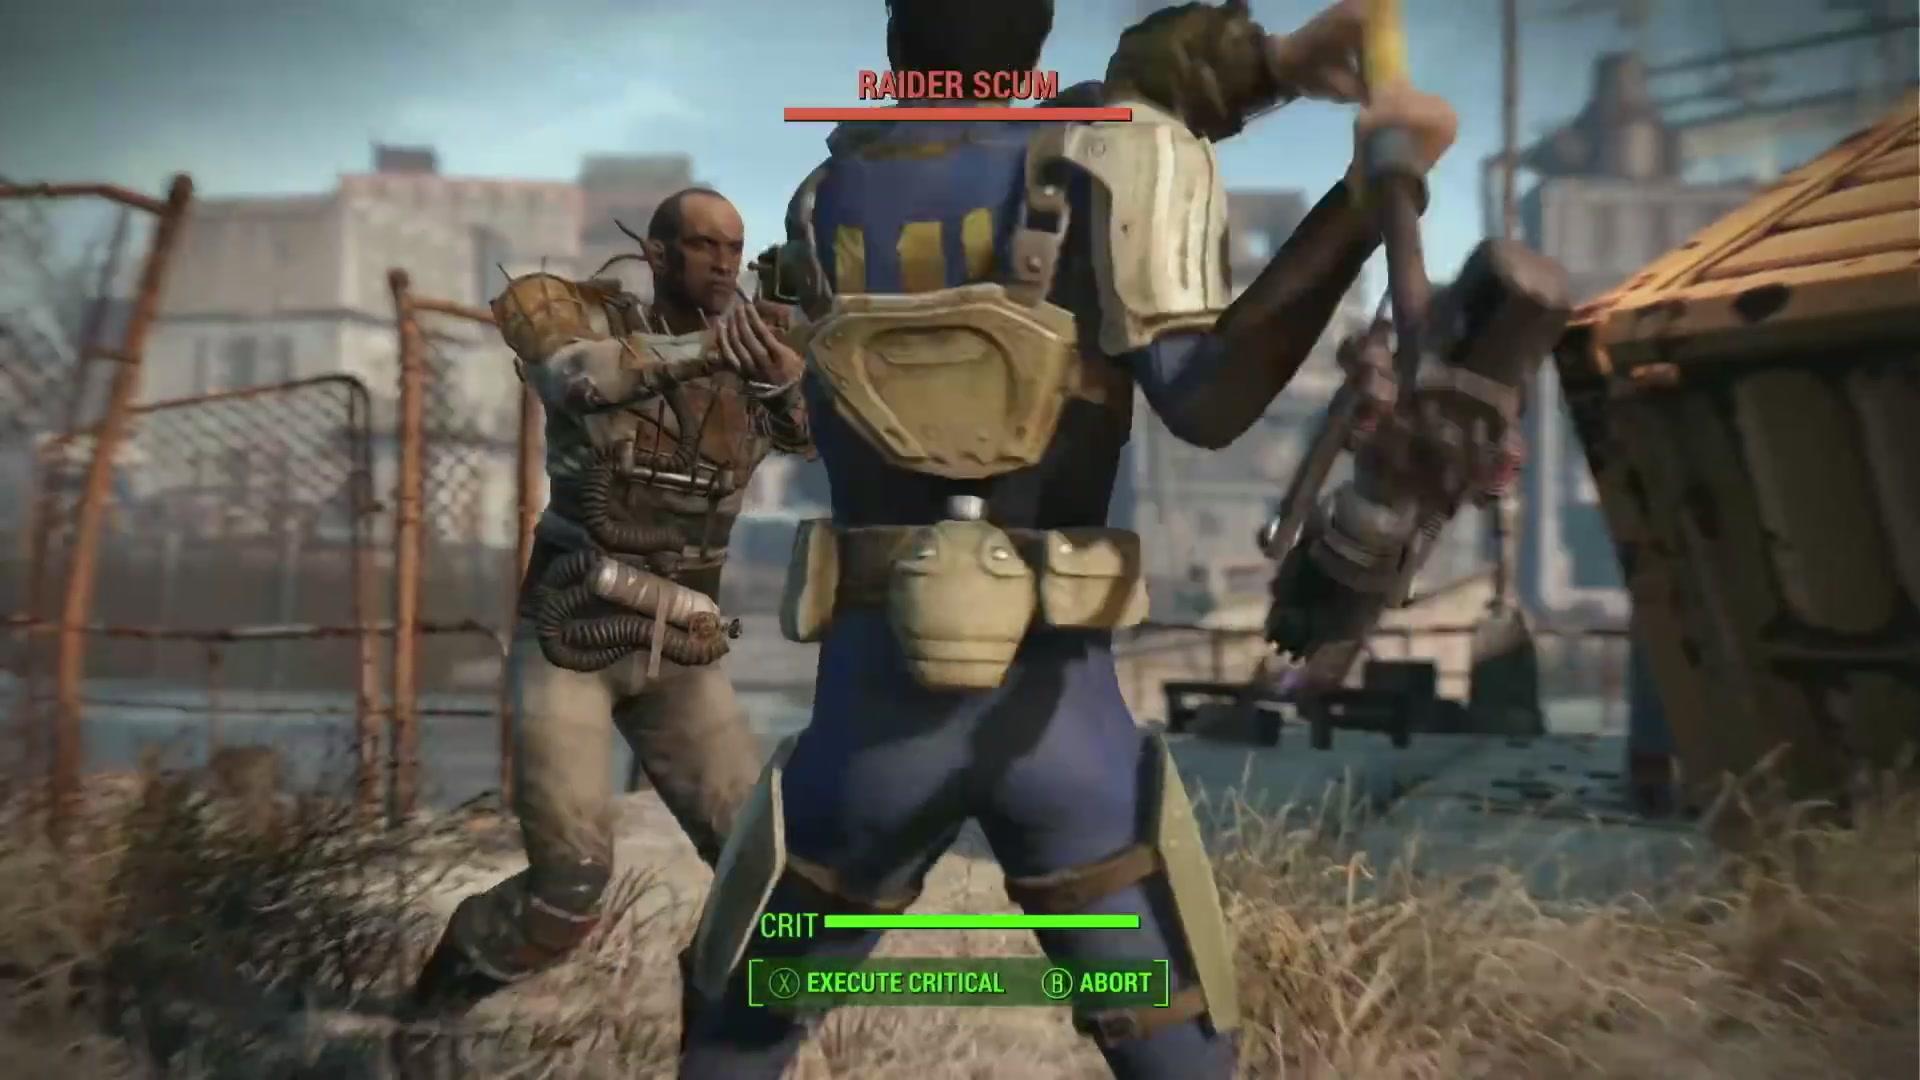 fallout_4_raider_scum4